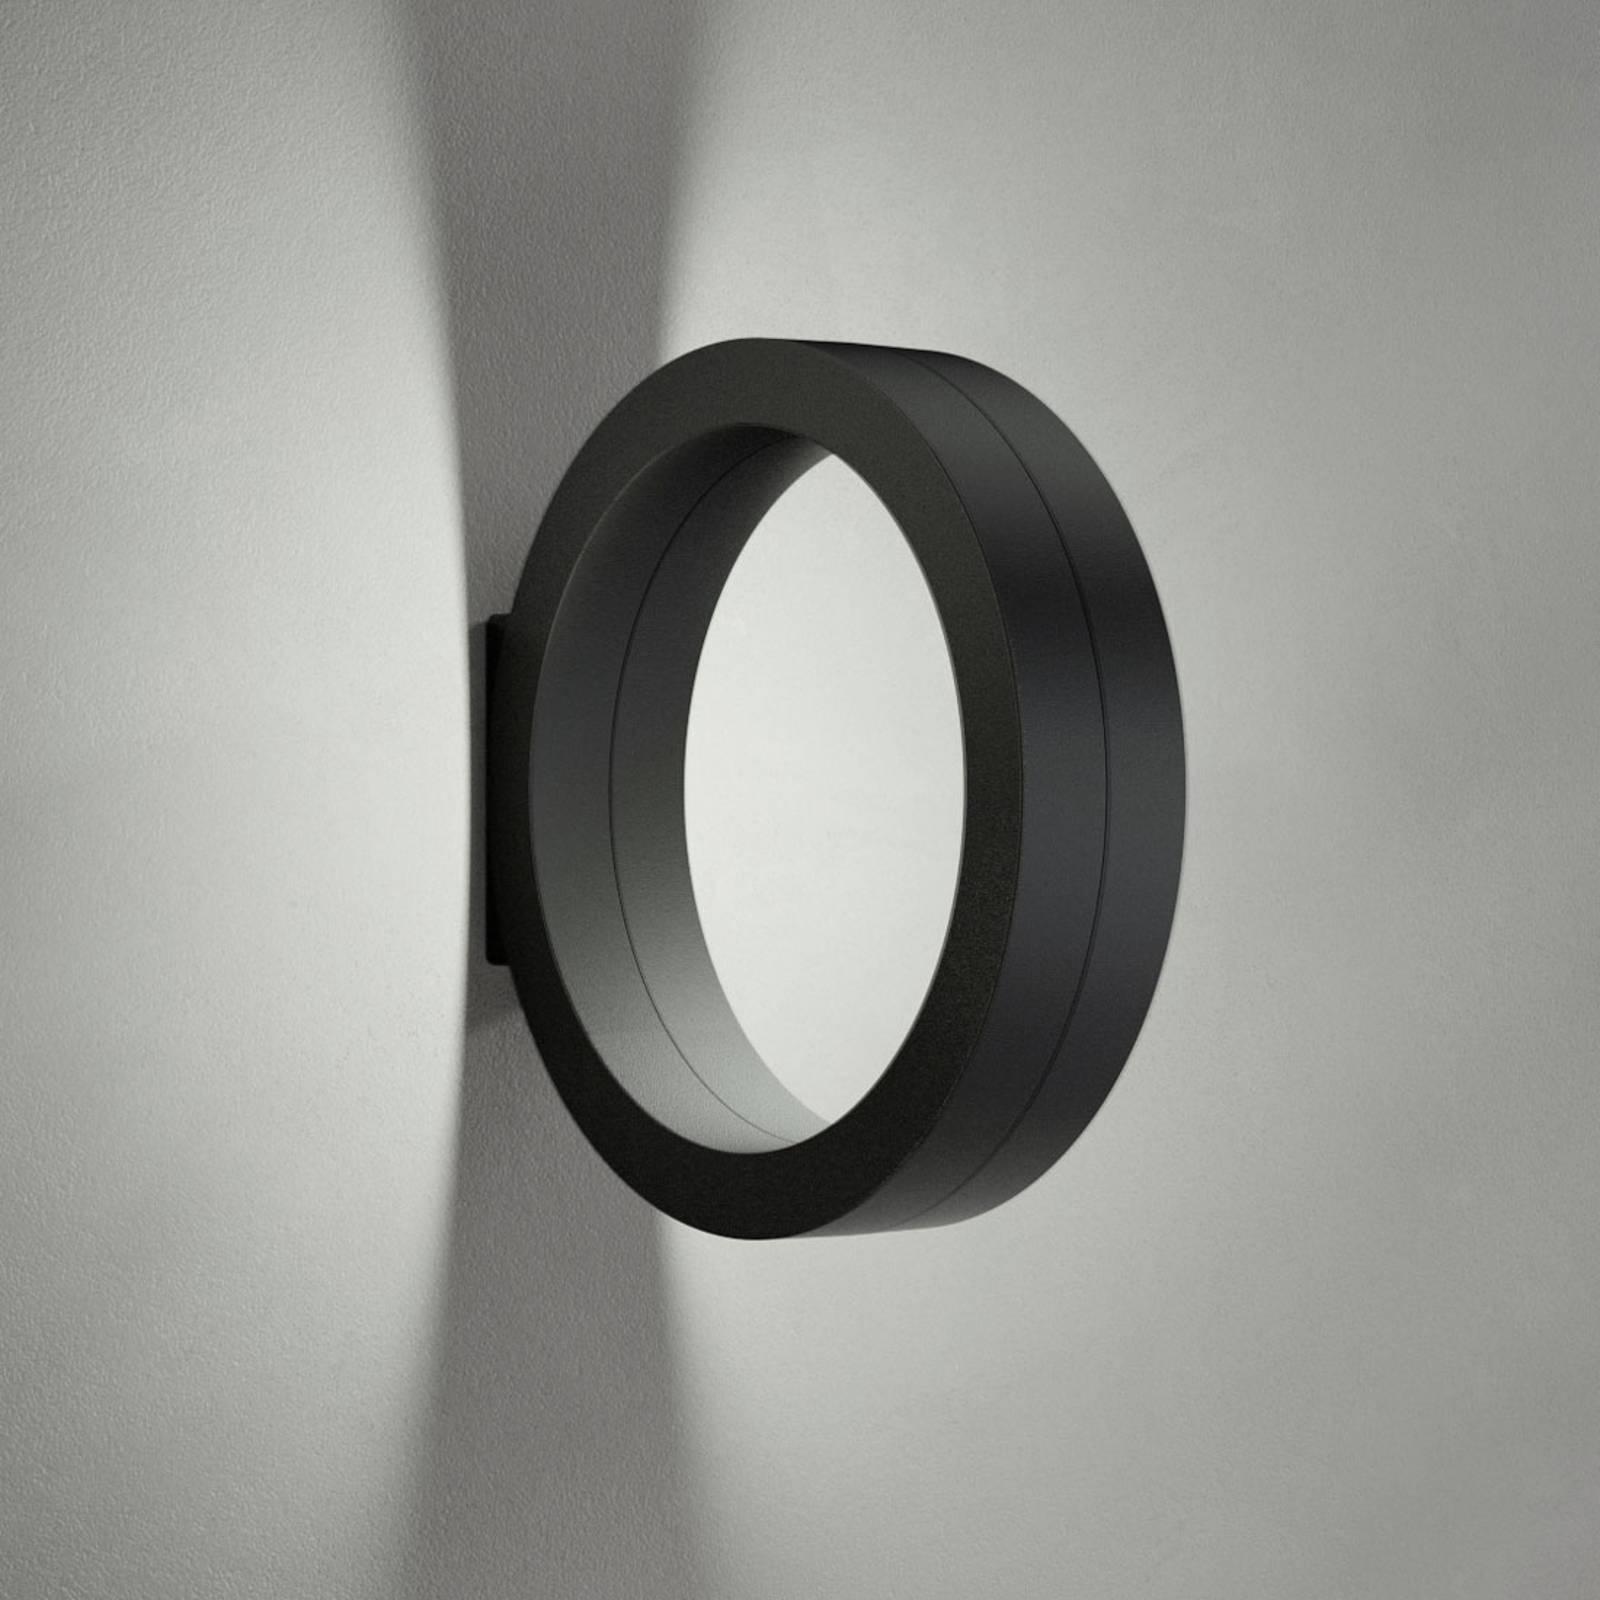 Cini&Nils Assolo - musta LED-seinäamppu himmennys